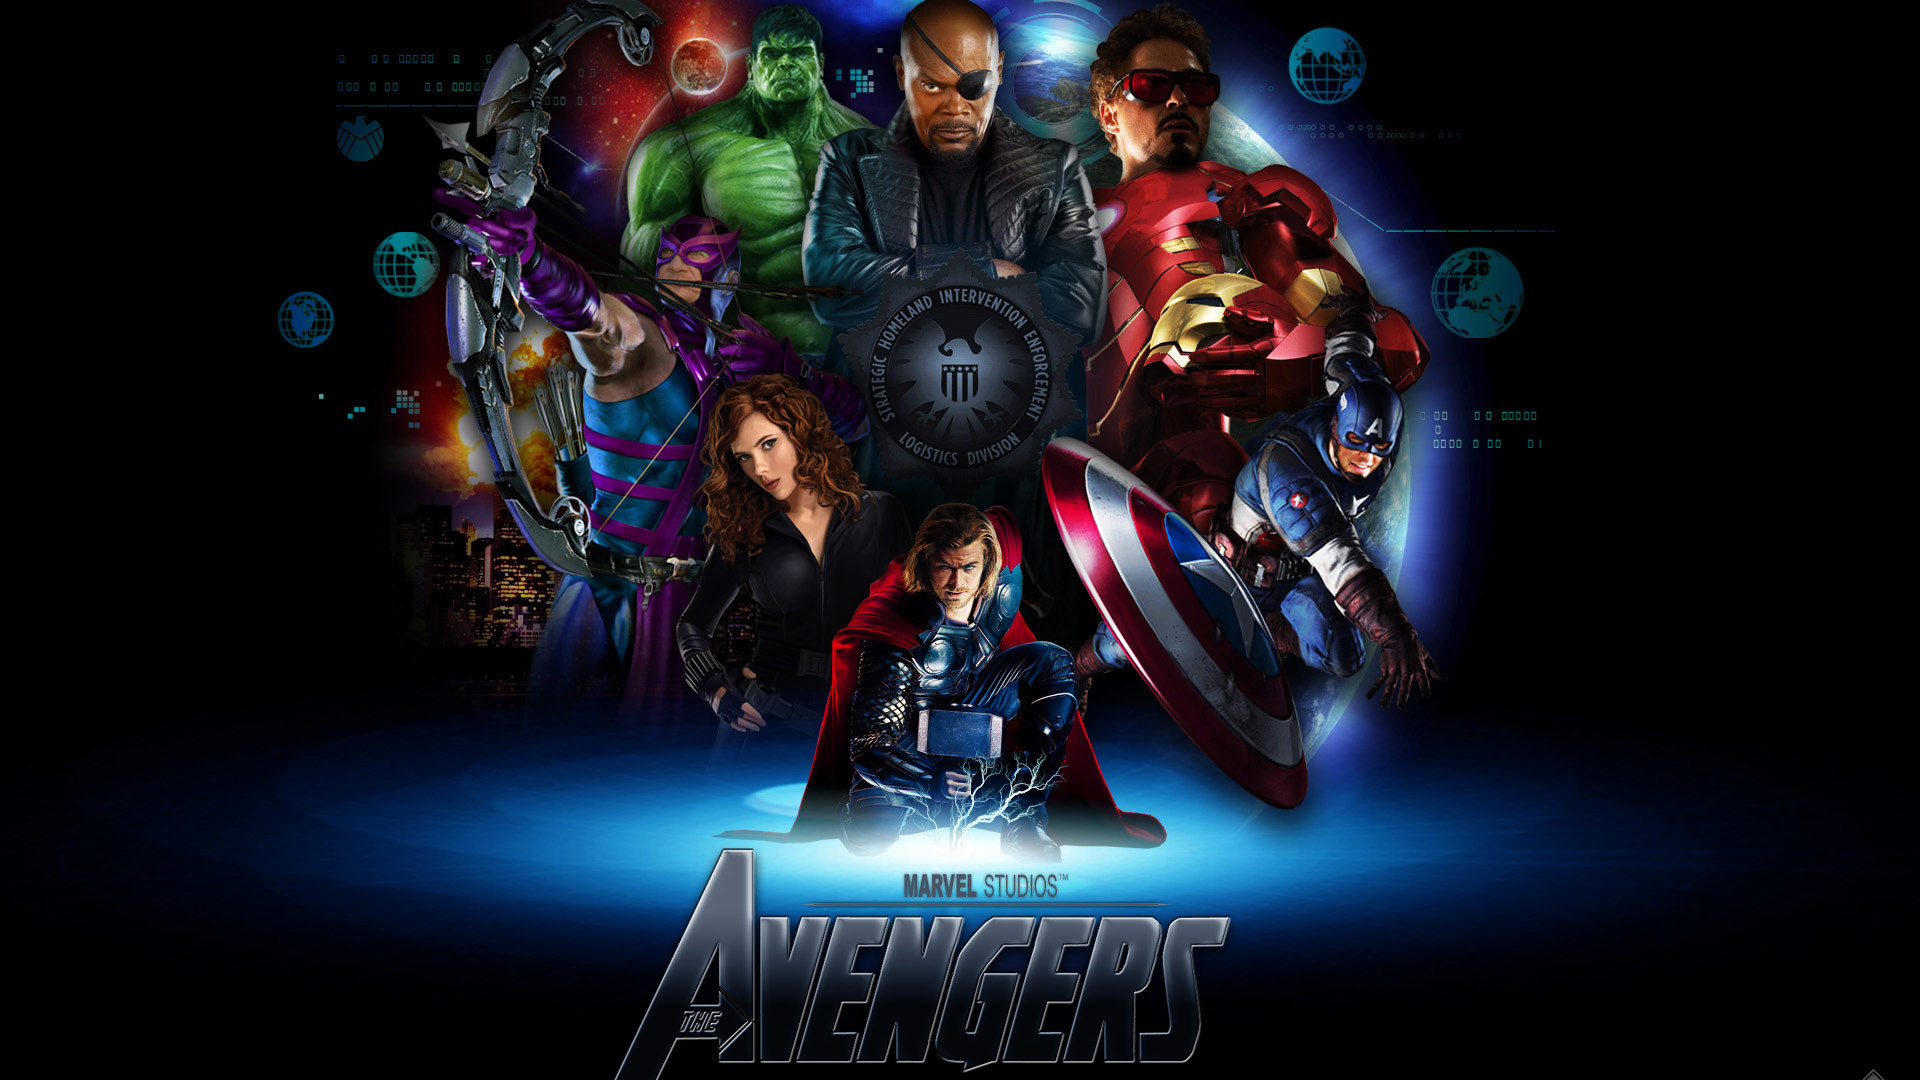 AvengersHD Wallpapers Free Download